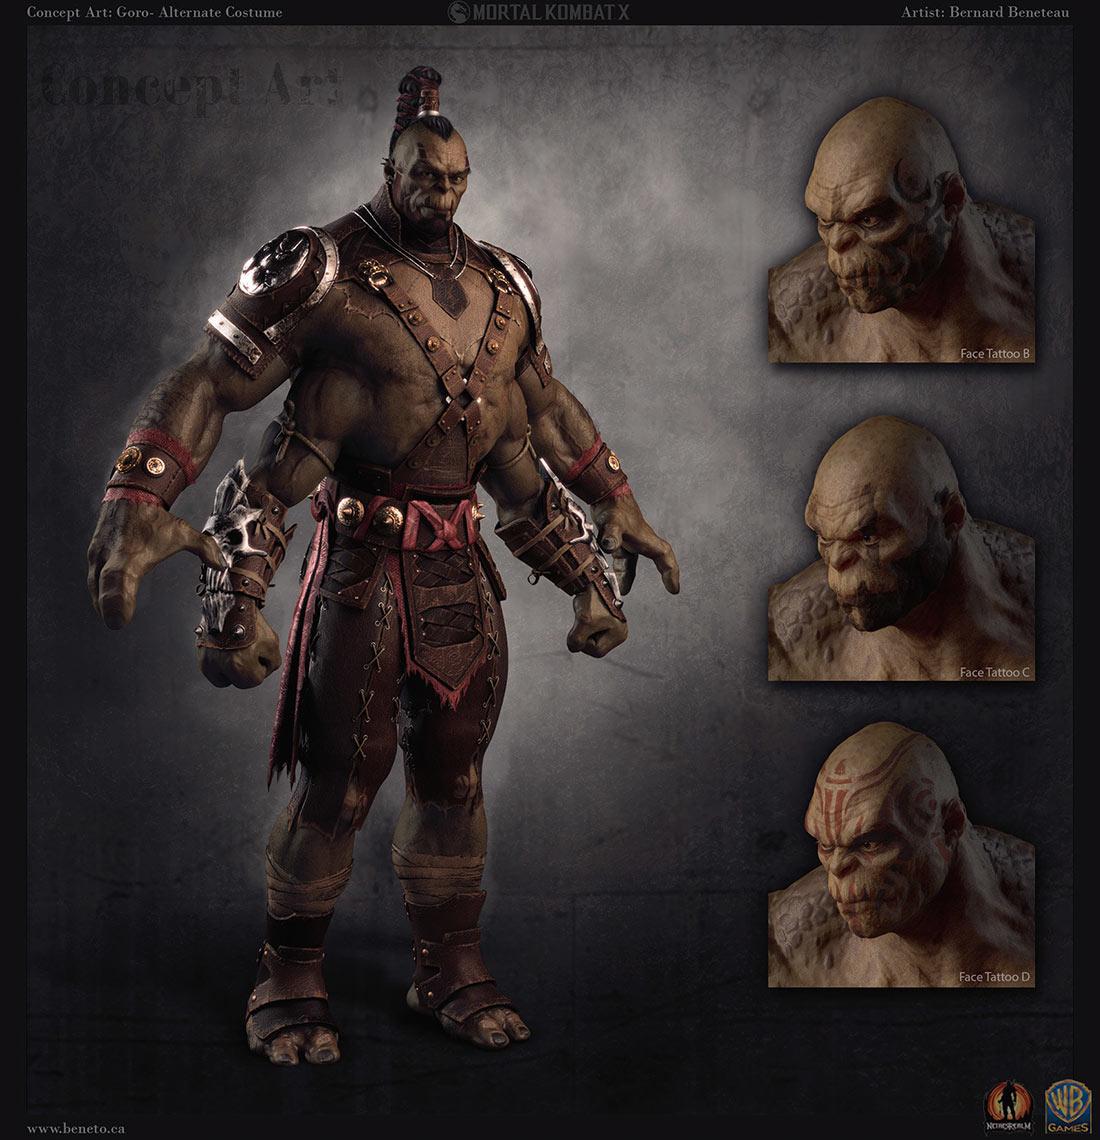 Character Design Mortal Kombat : Goro mortal kombat